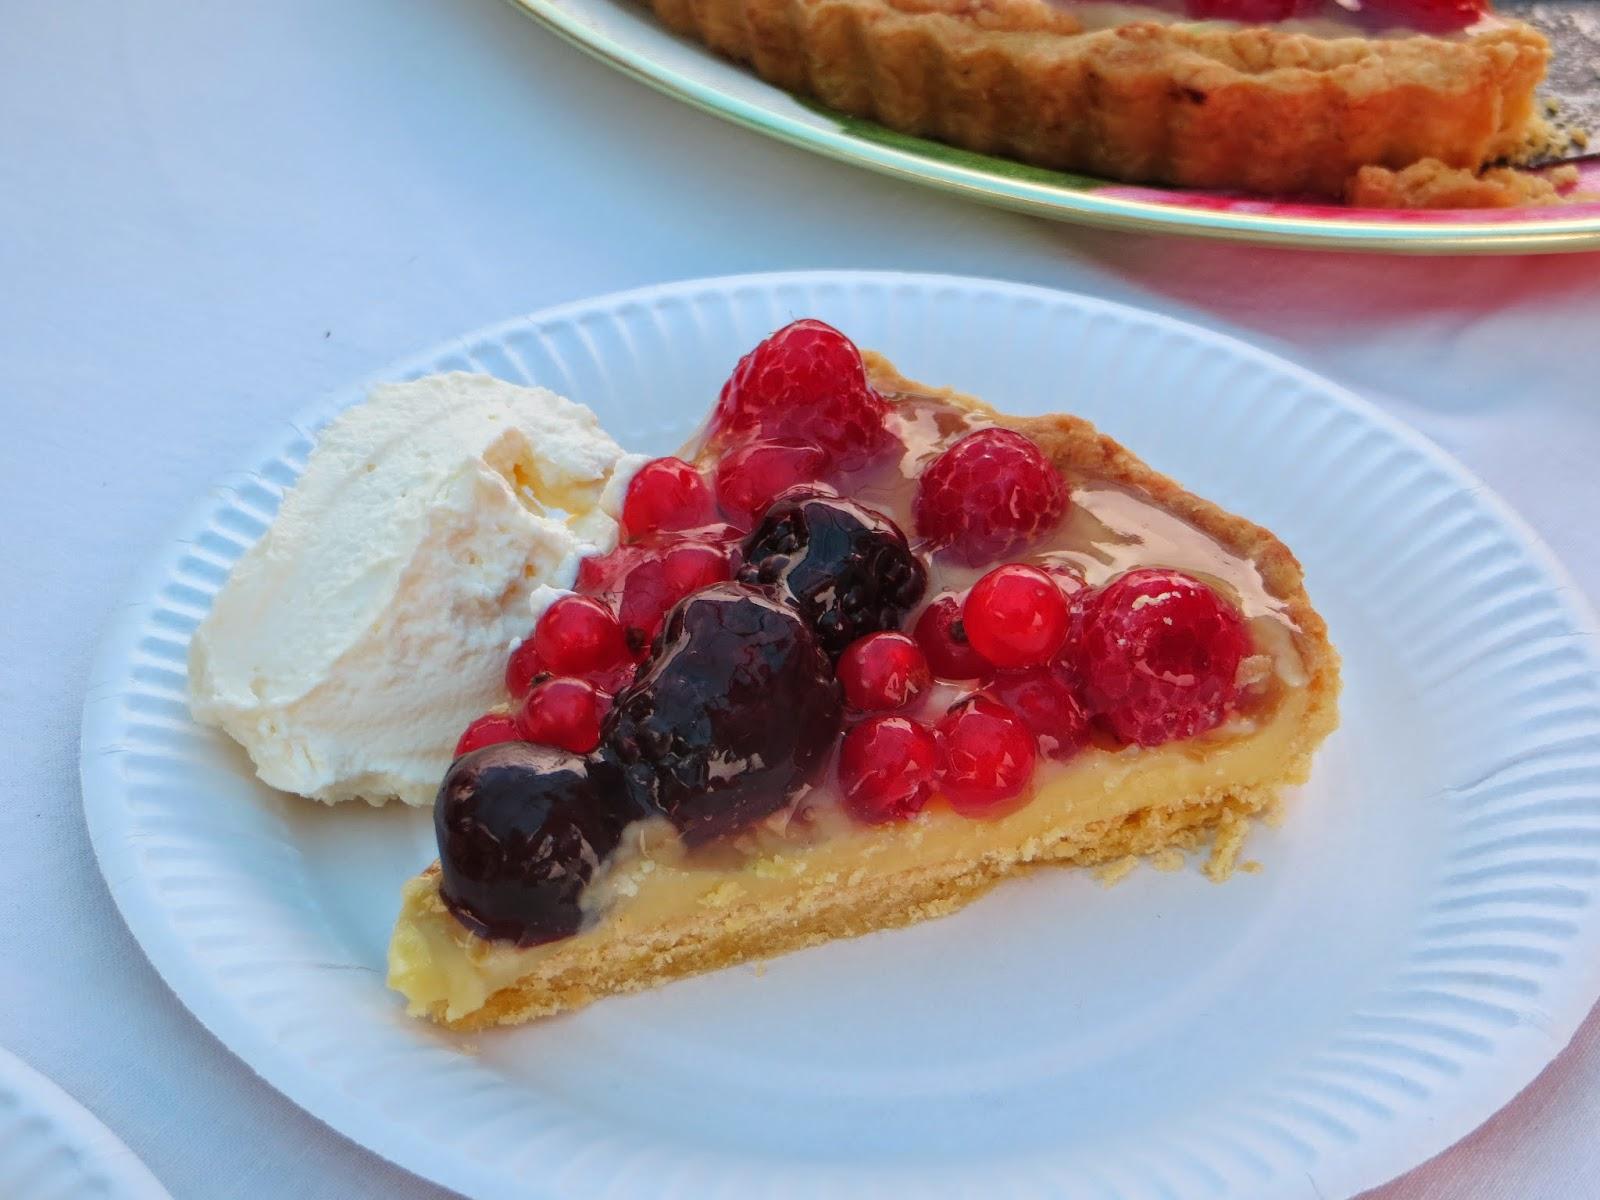 The tart cut beautifully and tasted wonderful.